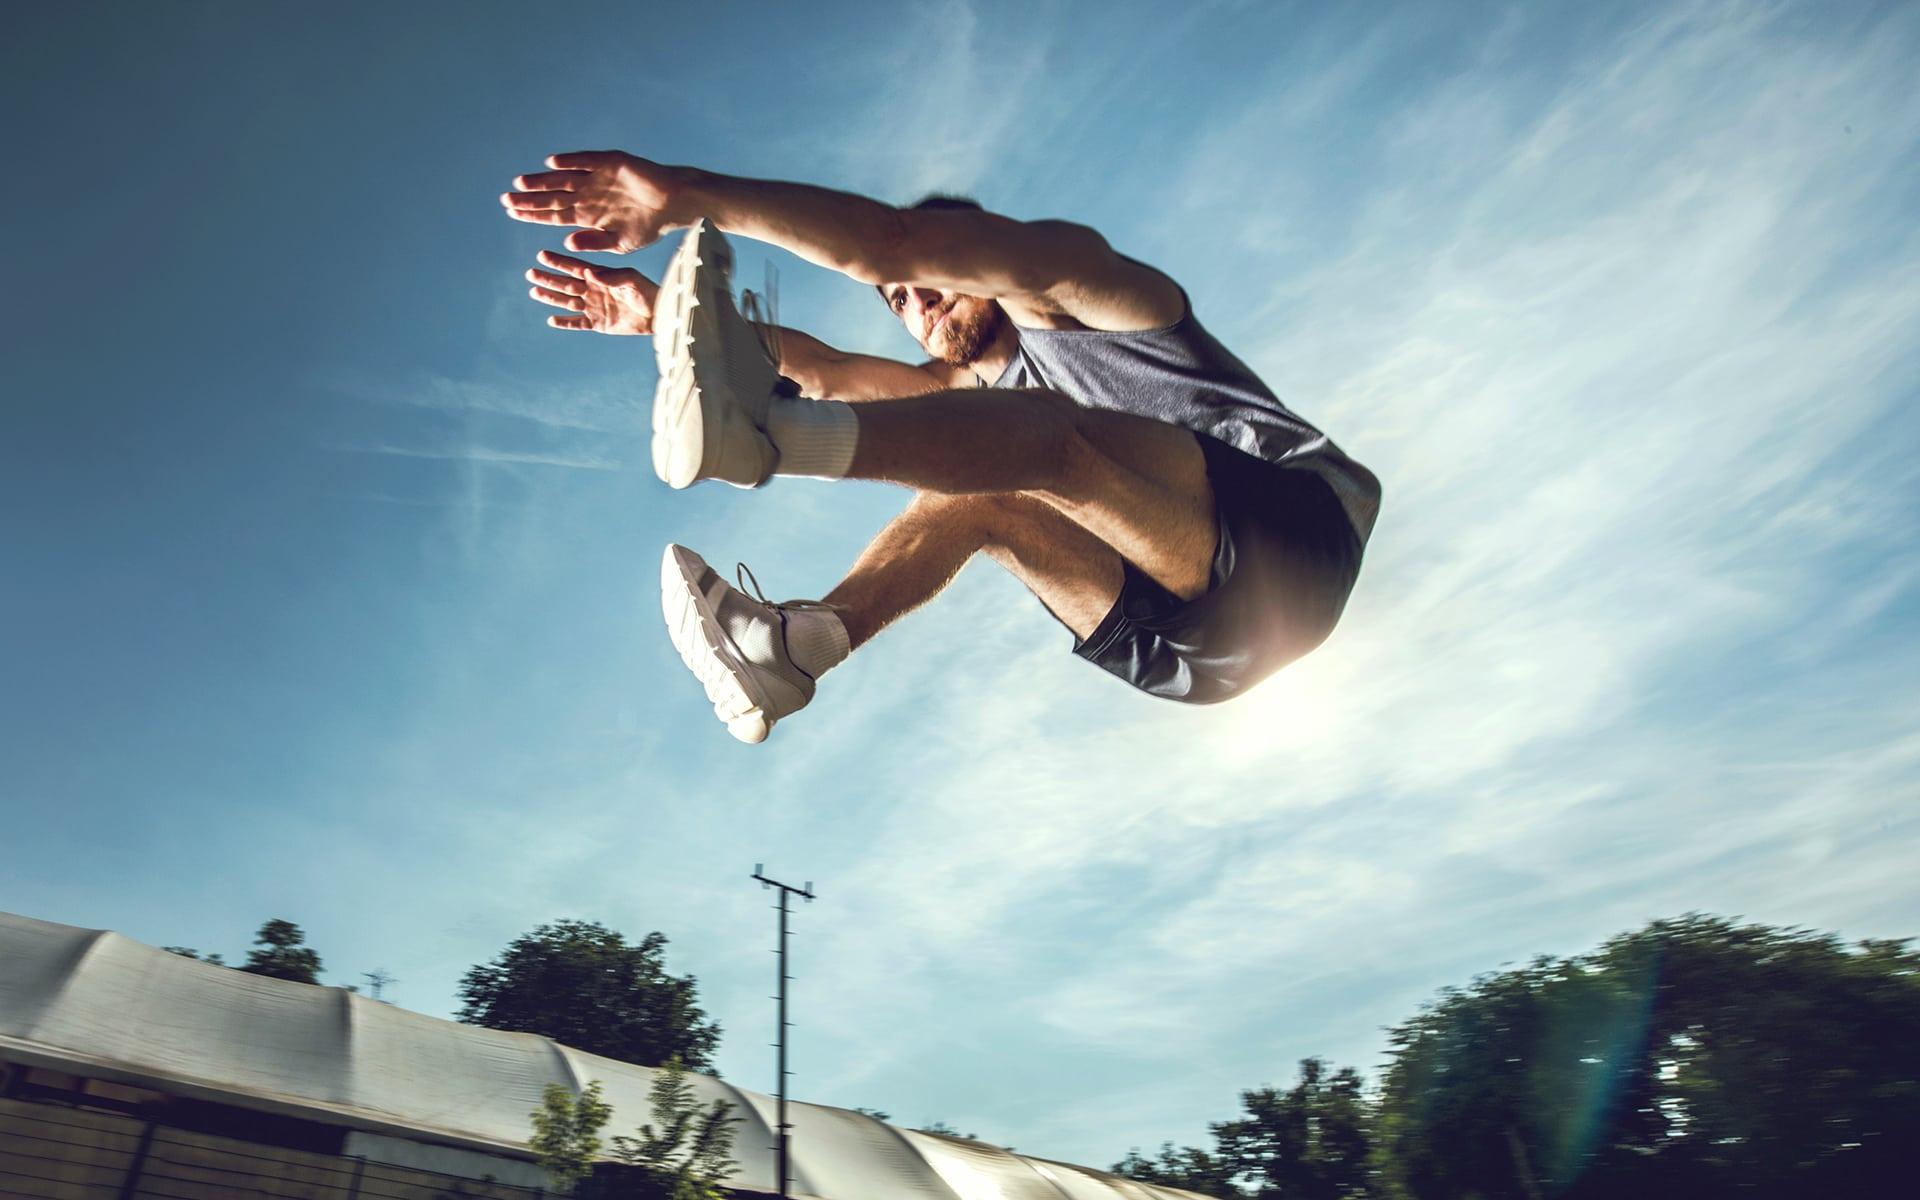 Process Performance - man optimises his long jump performance